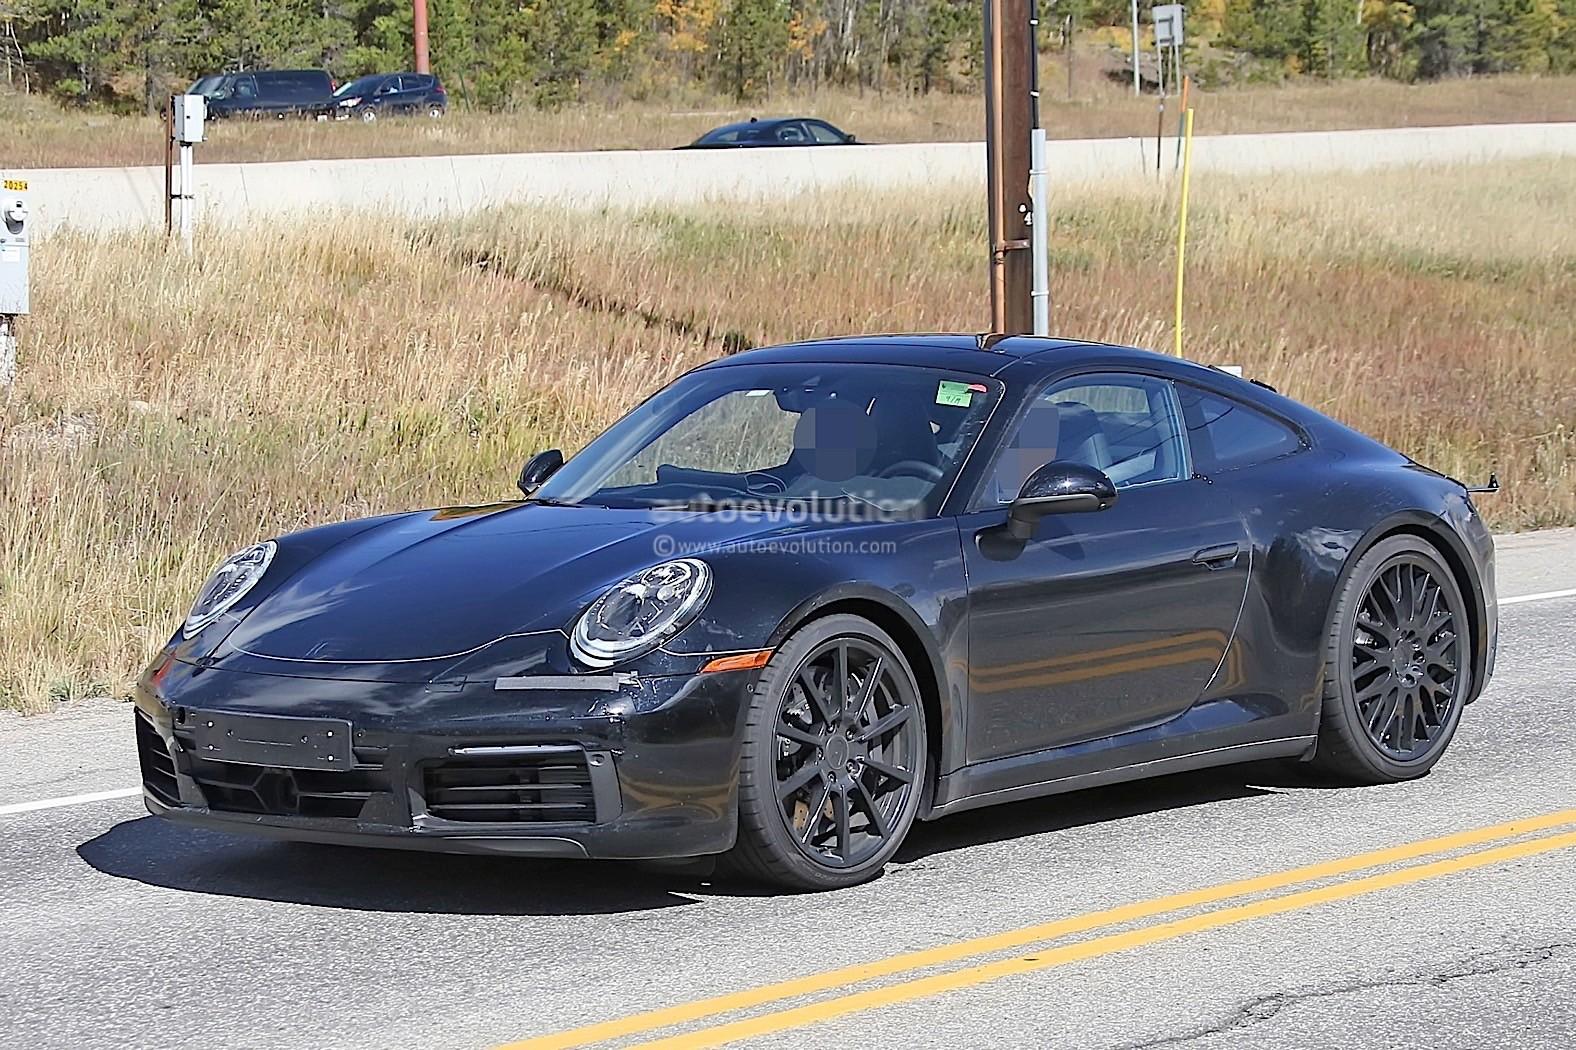 2019 Porsche 911 Flies on Nurburgring While Hybrid Rumors ...